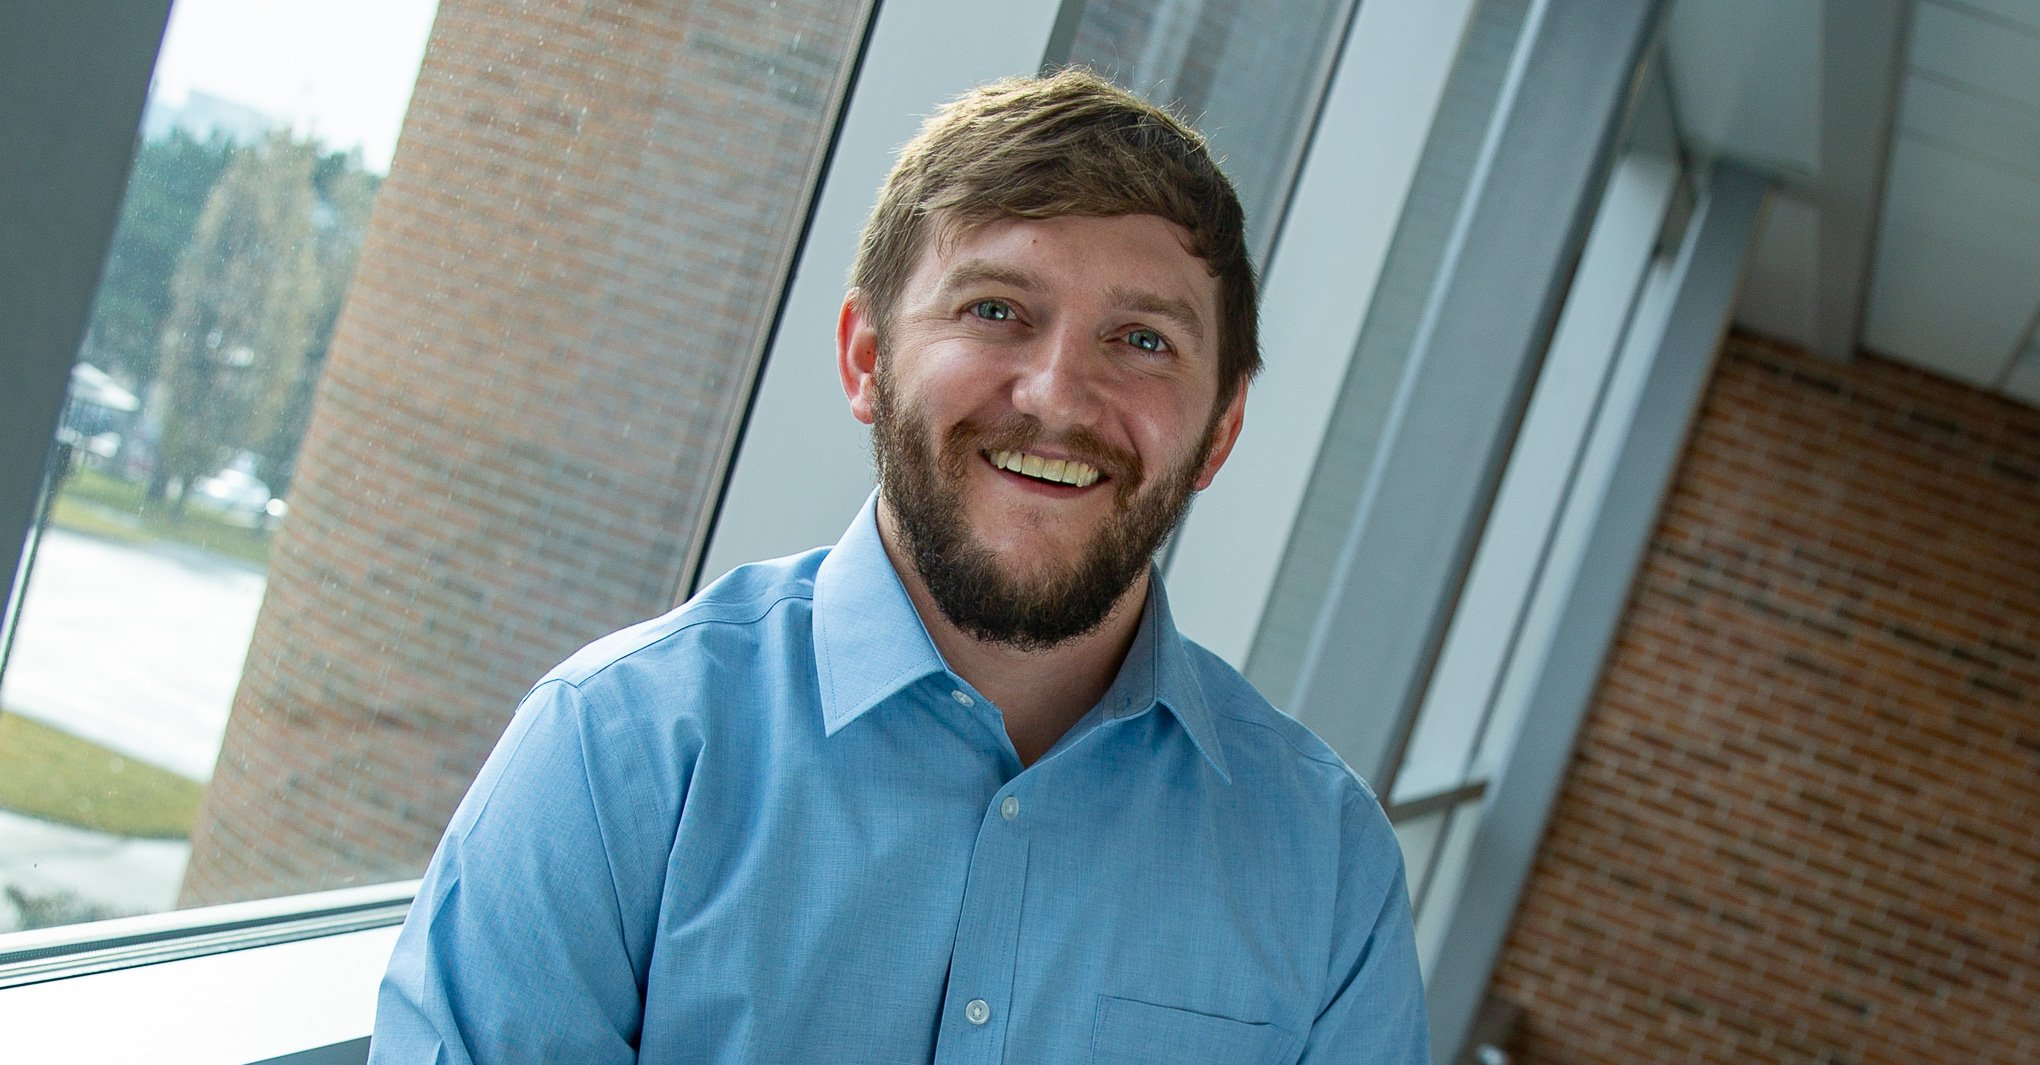 NMC alumnus and returning graduate student Troy Beekman at Nebraska Methodist College.